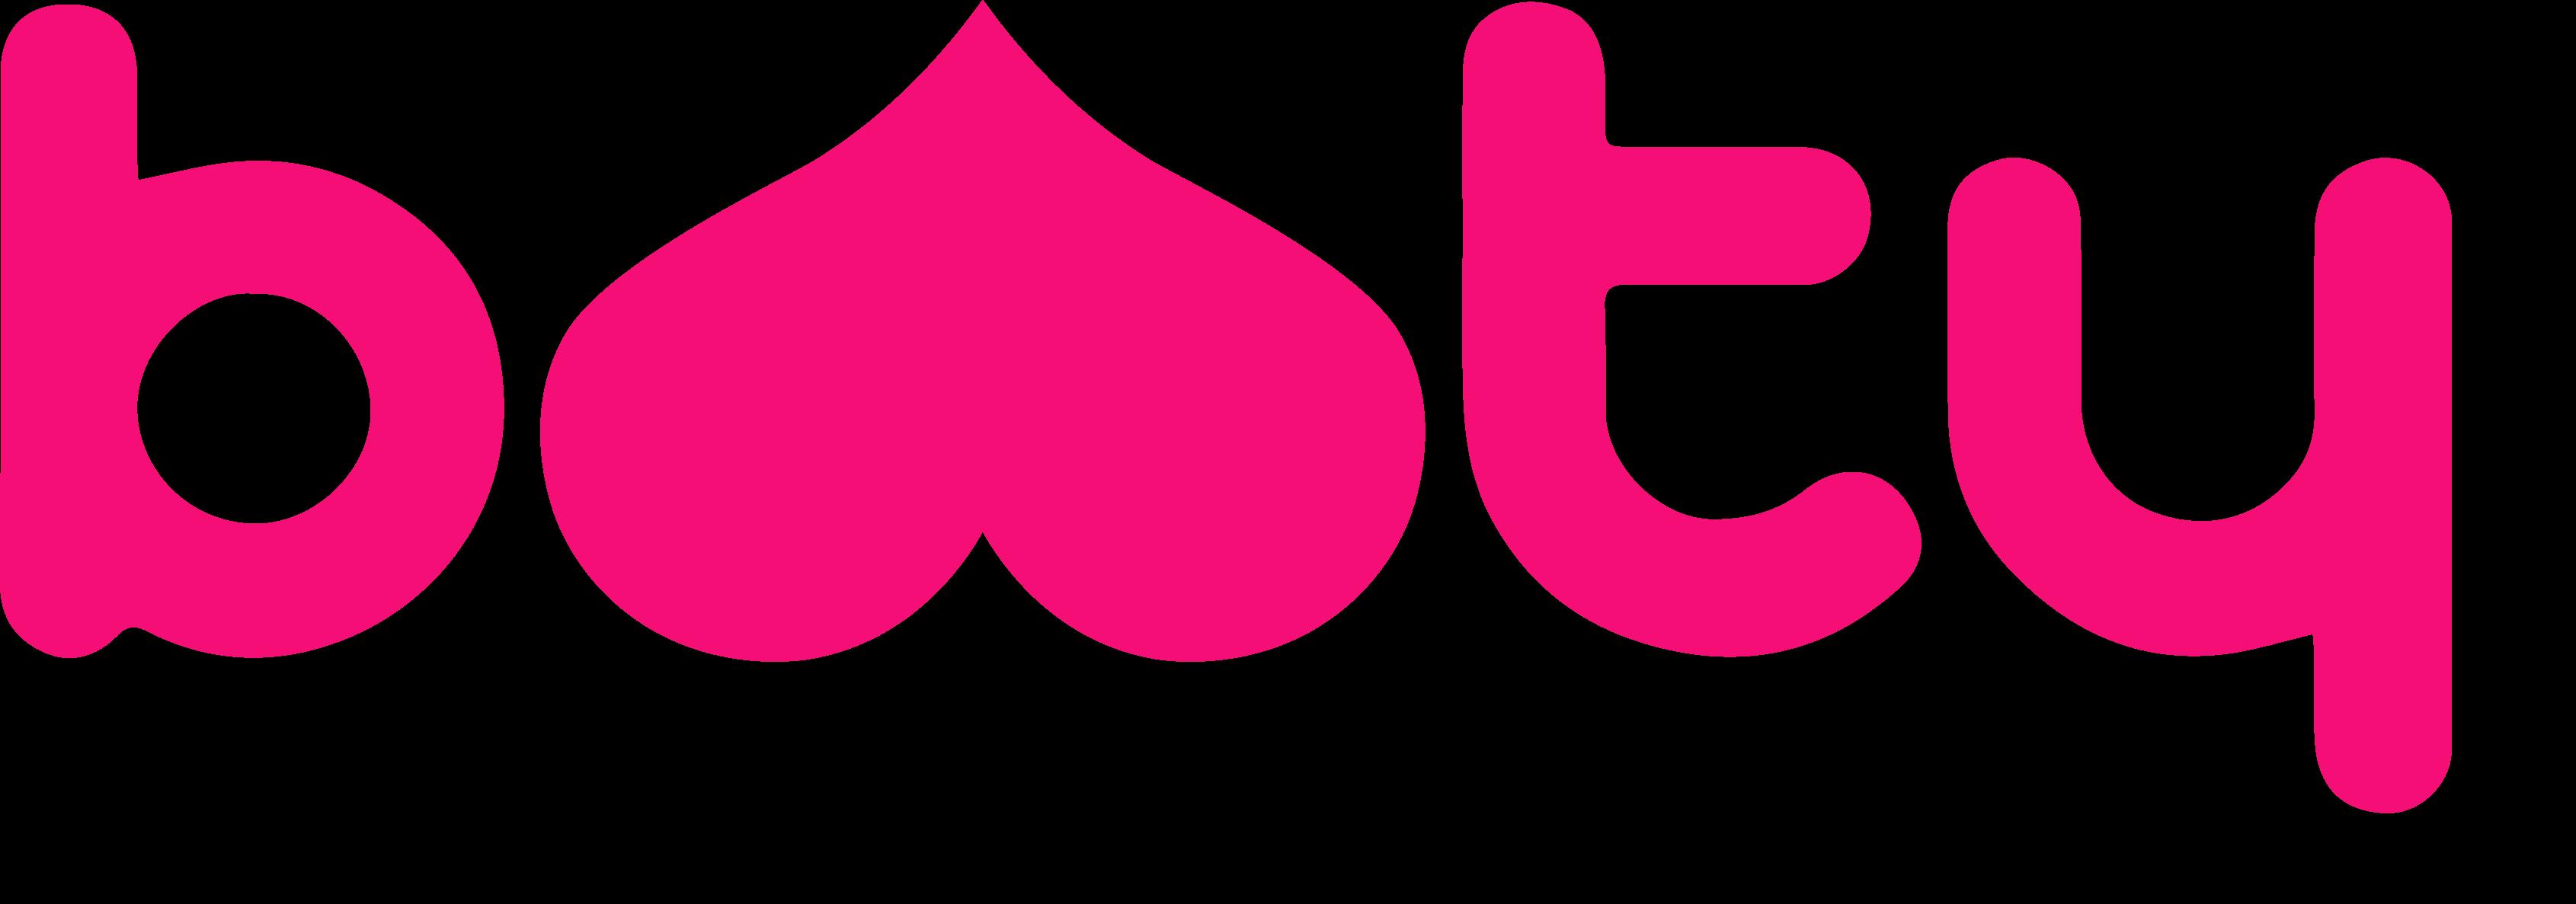 Booty by Brabants Logo